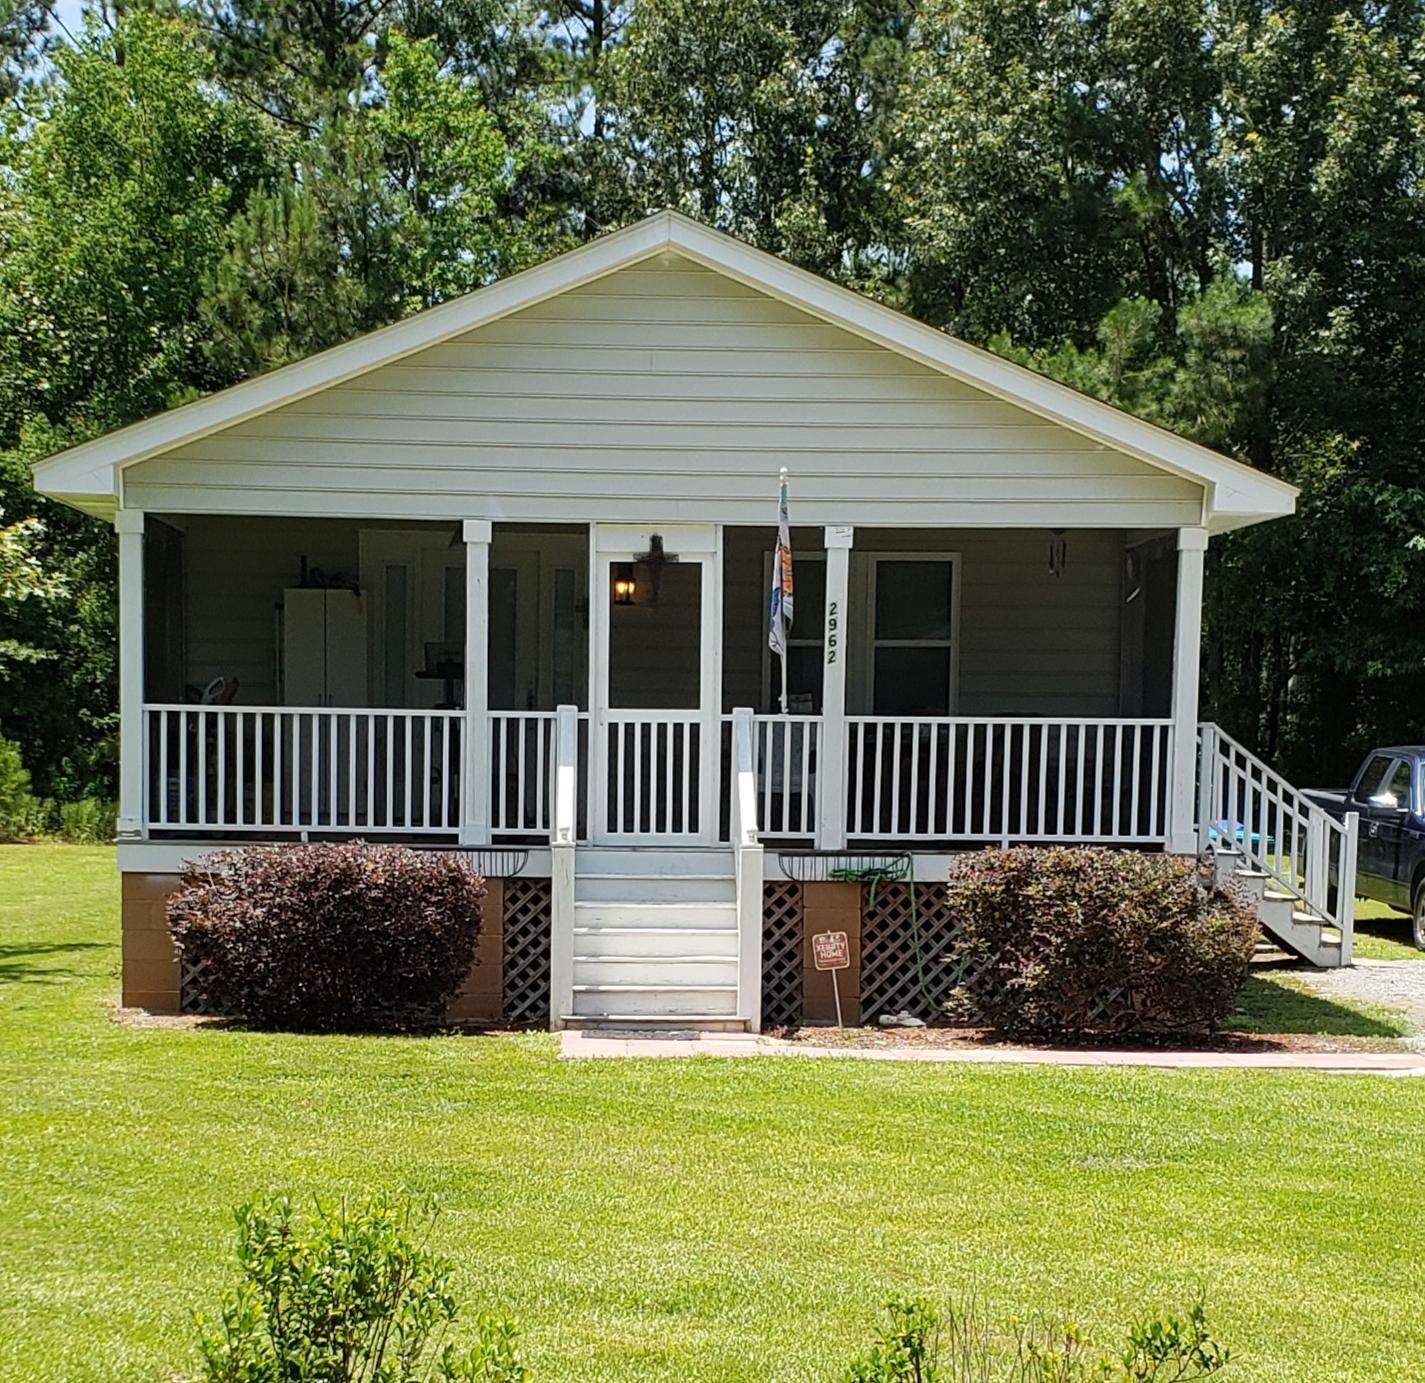 Ravenel Acres Homes For Sale - 2962 Bobo, Mount Pleasant, SC - 7